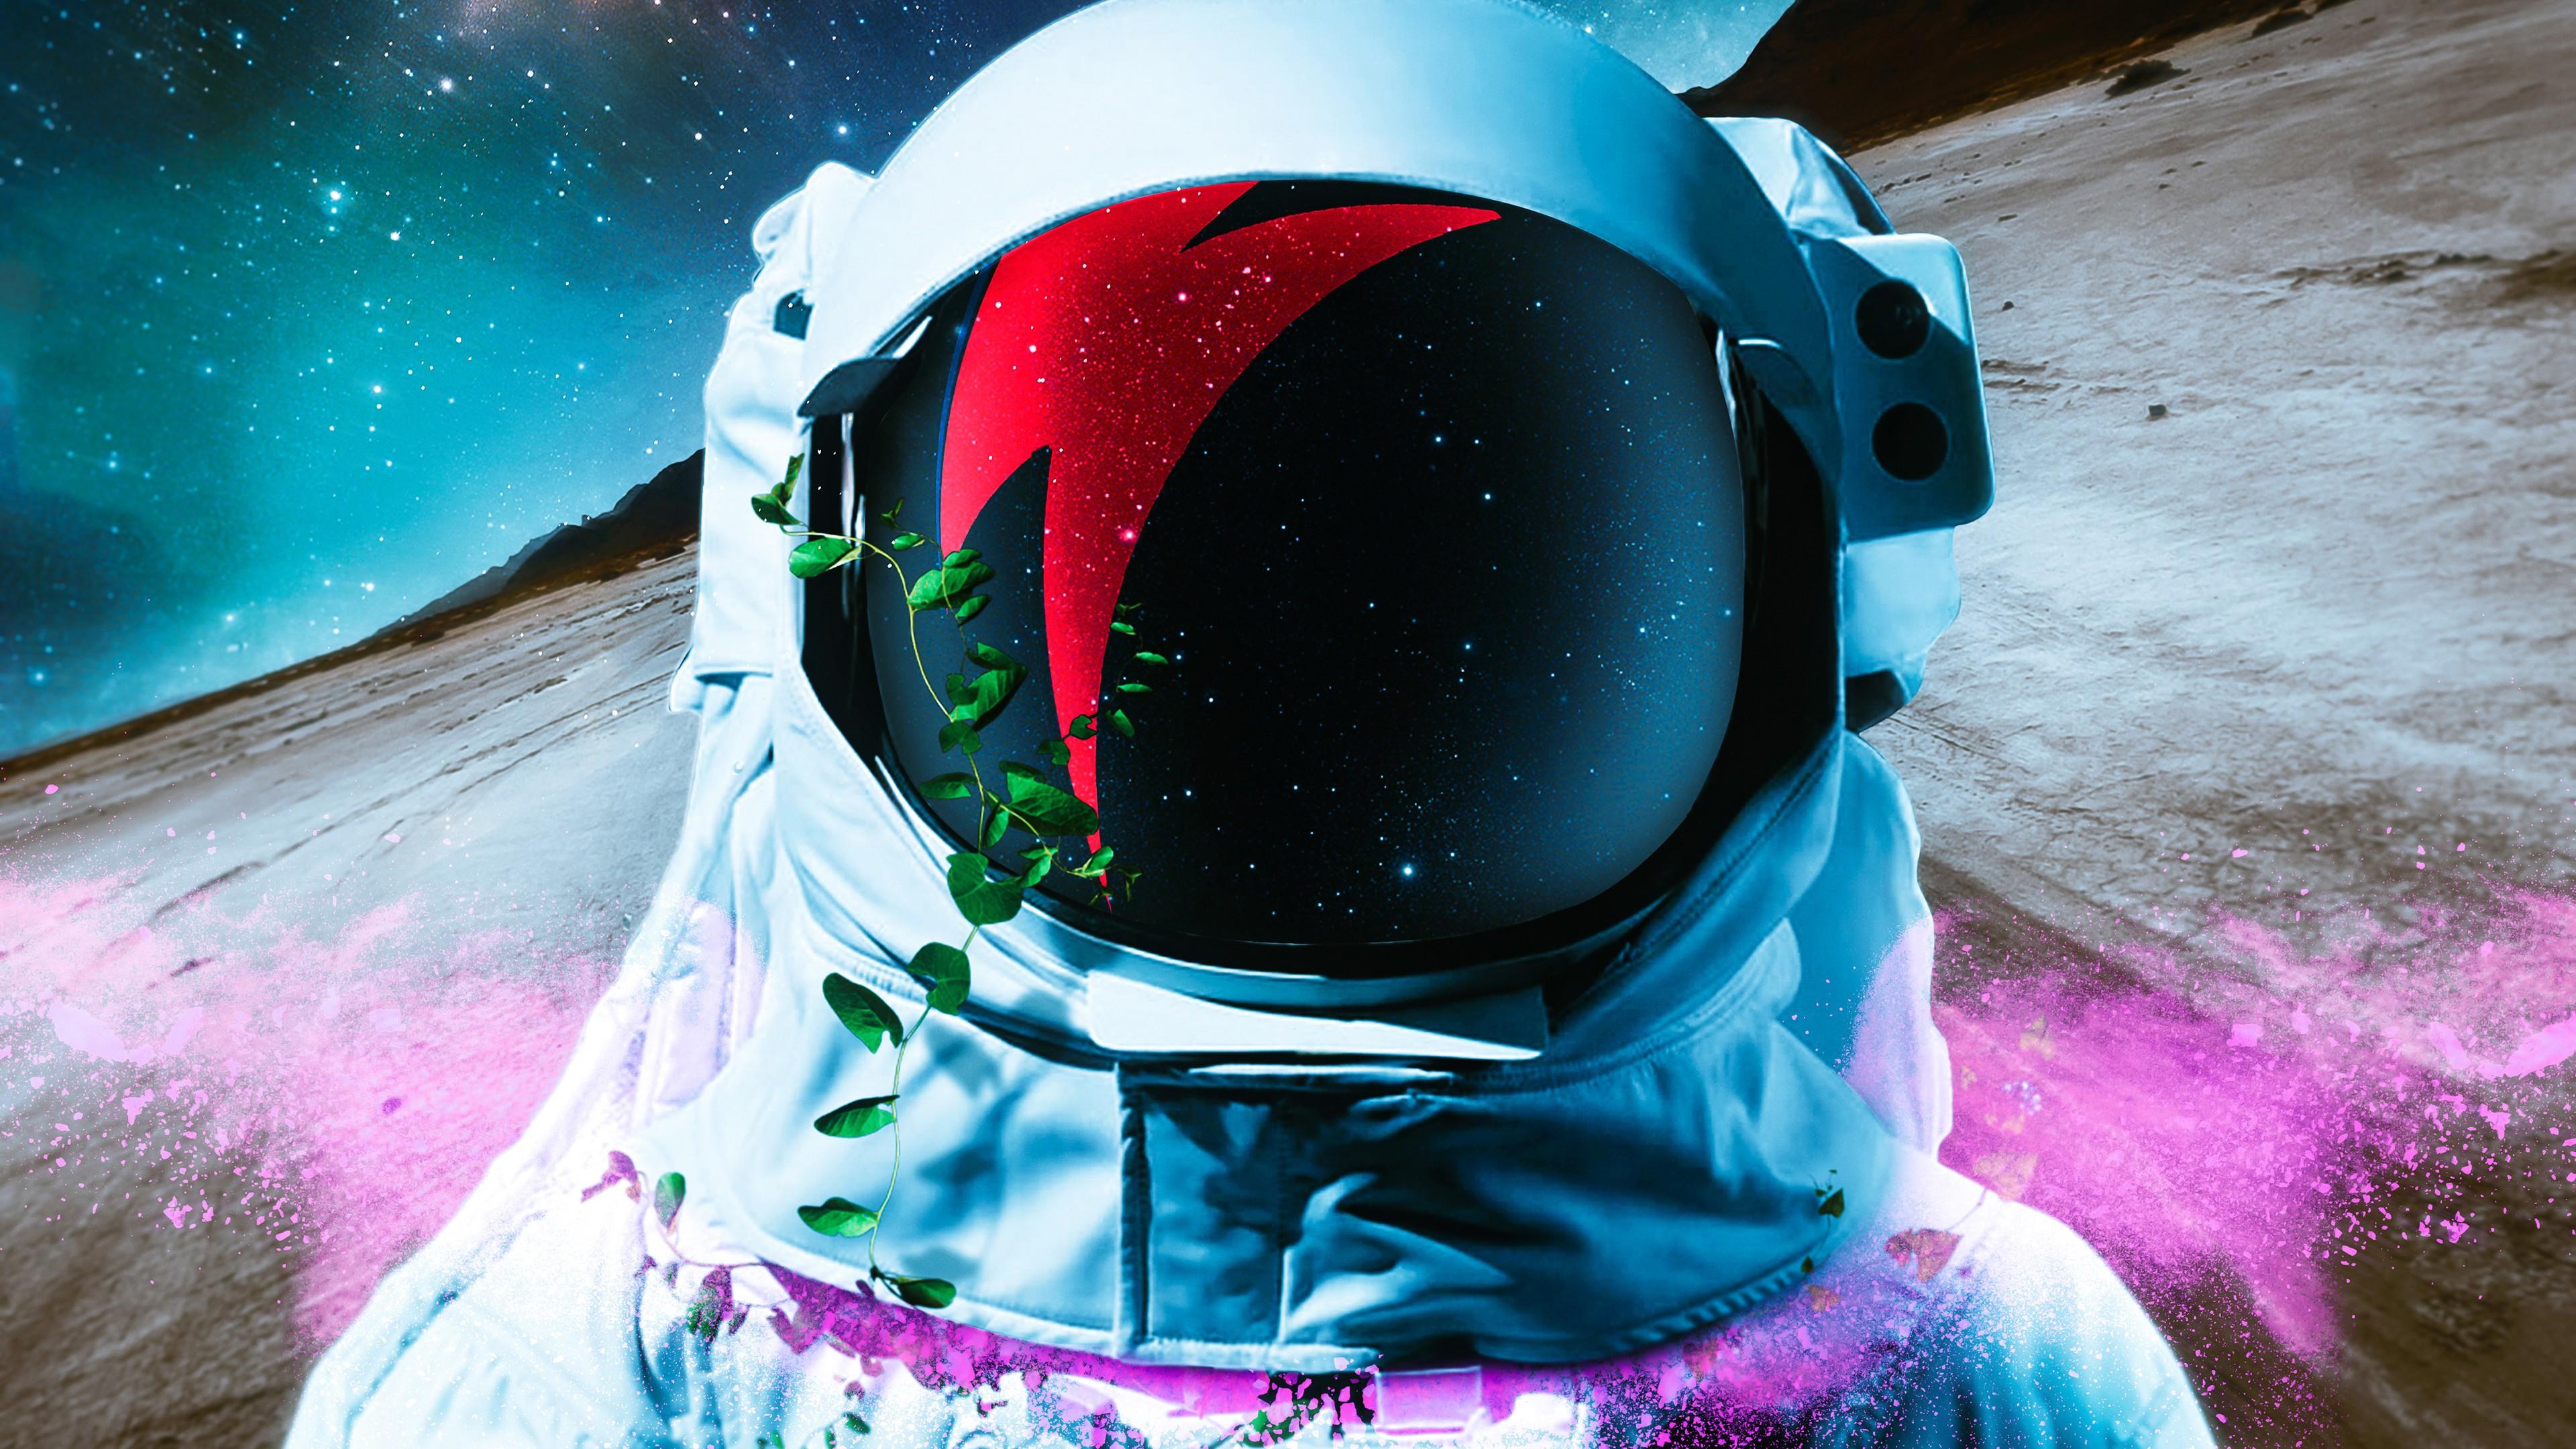 Картинки на аву космонавта